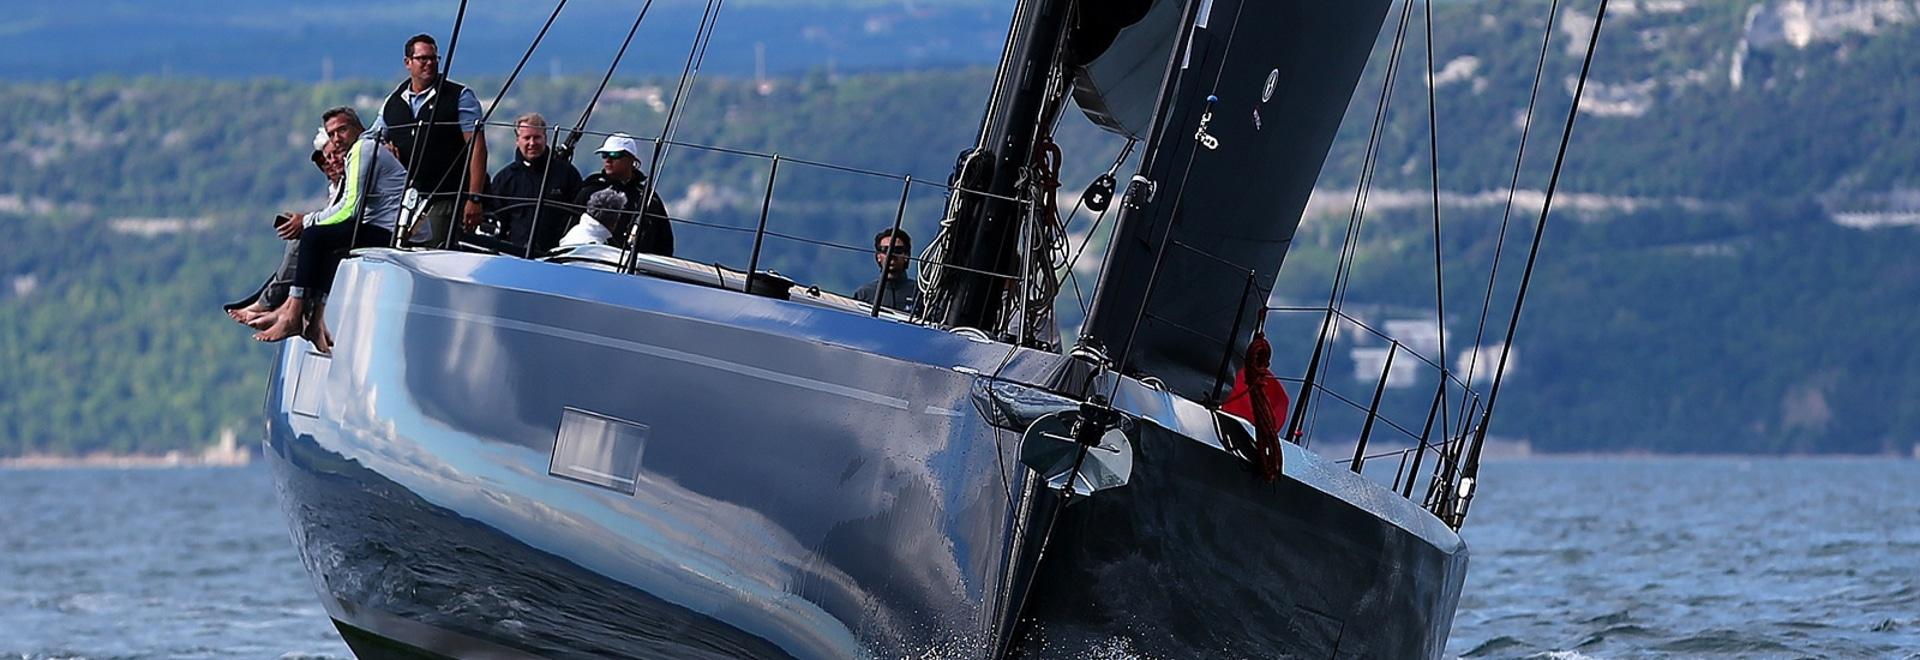 GS80: Inside Grand Soleil's 25.95 Metre Sailing Flagship